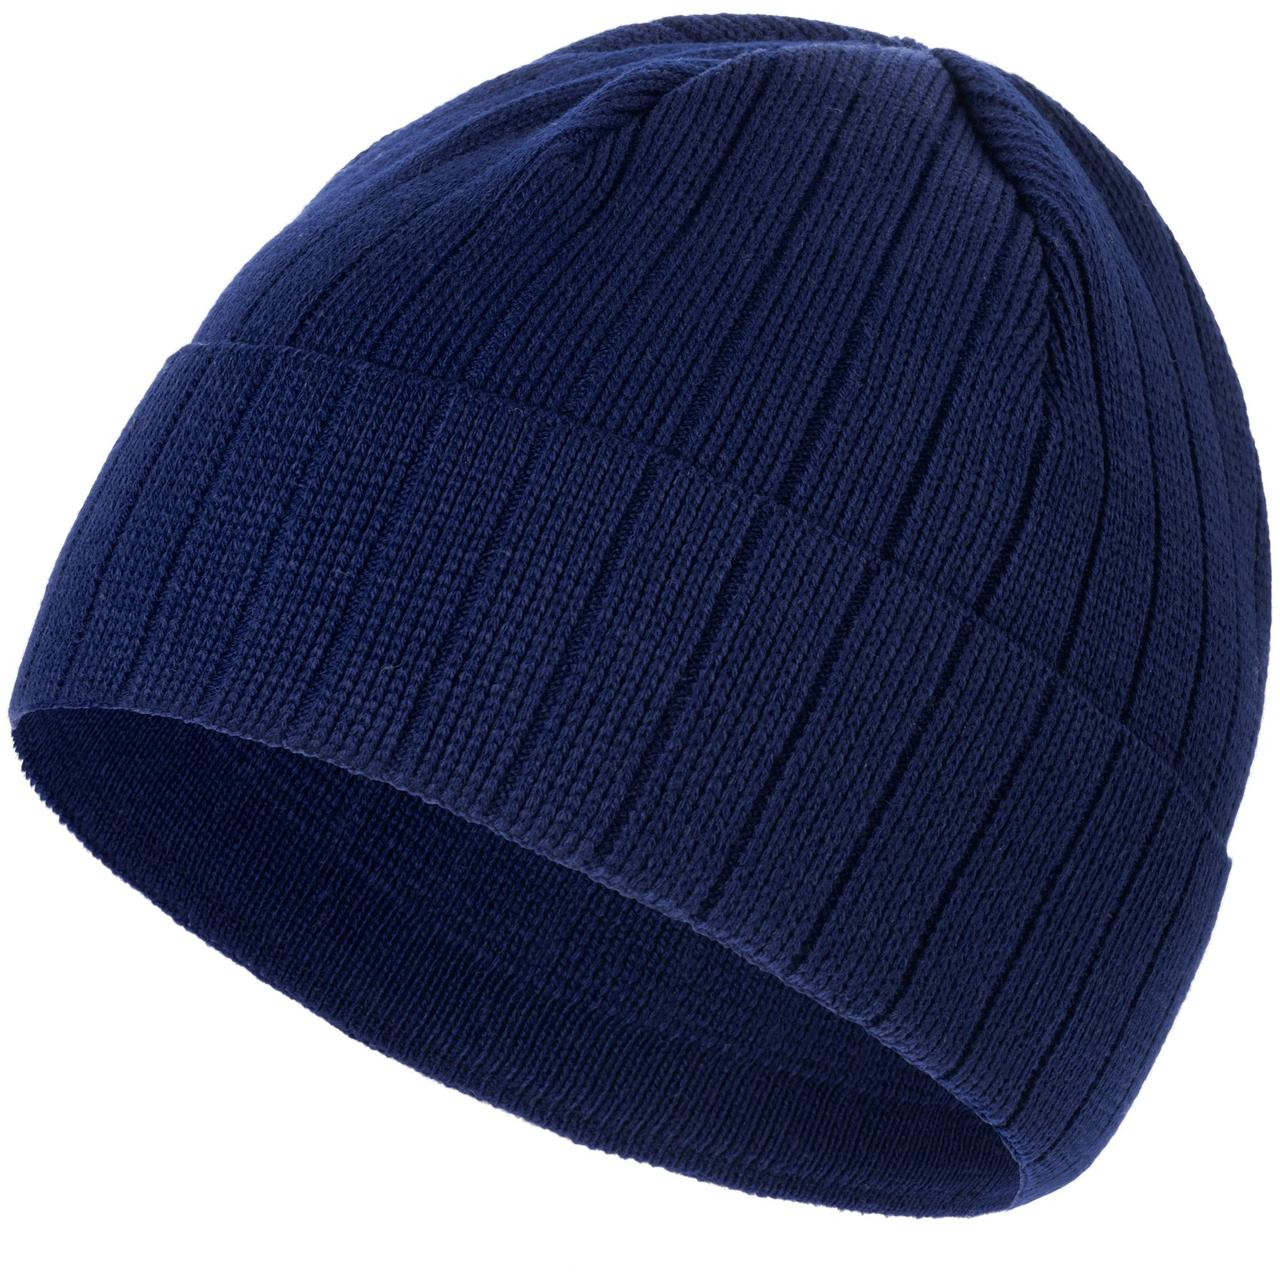 Шапка Lima, синяя (сапфир) (артикул 41152.44)